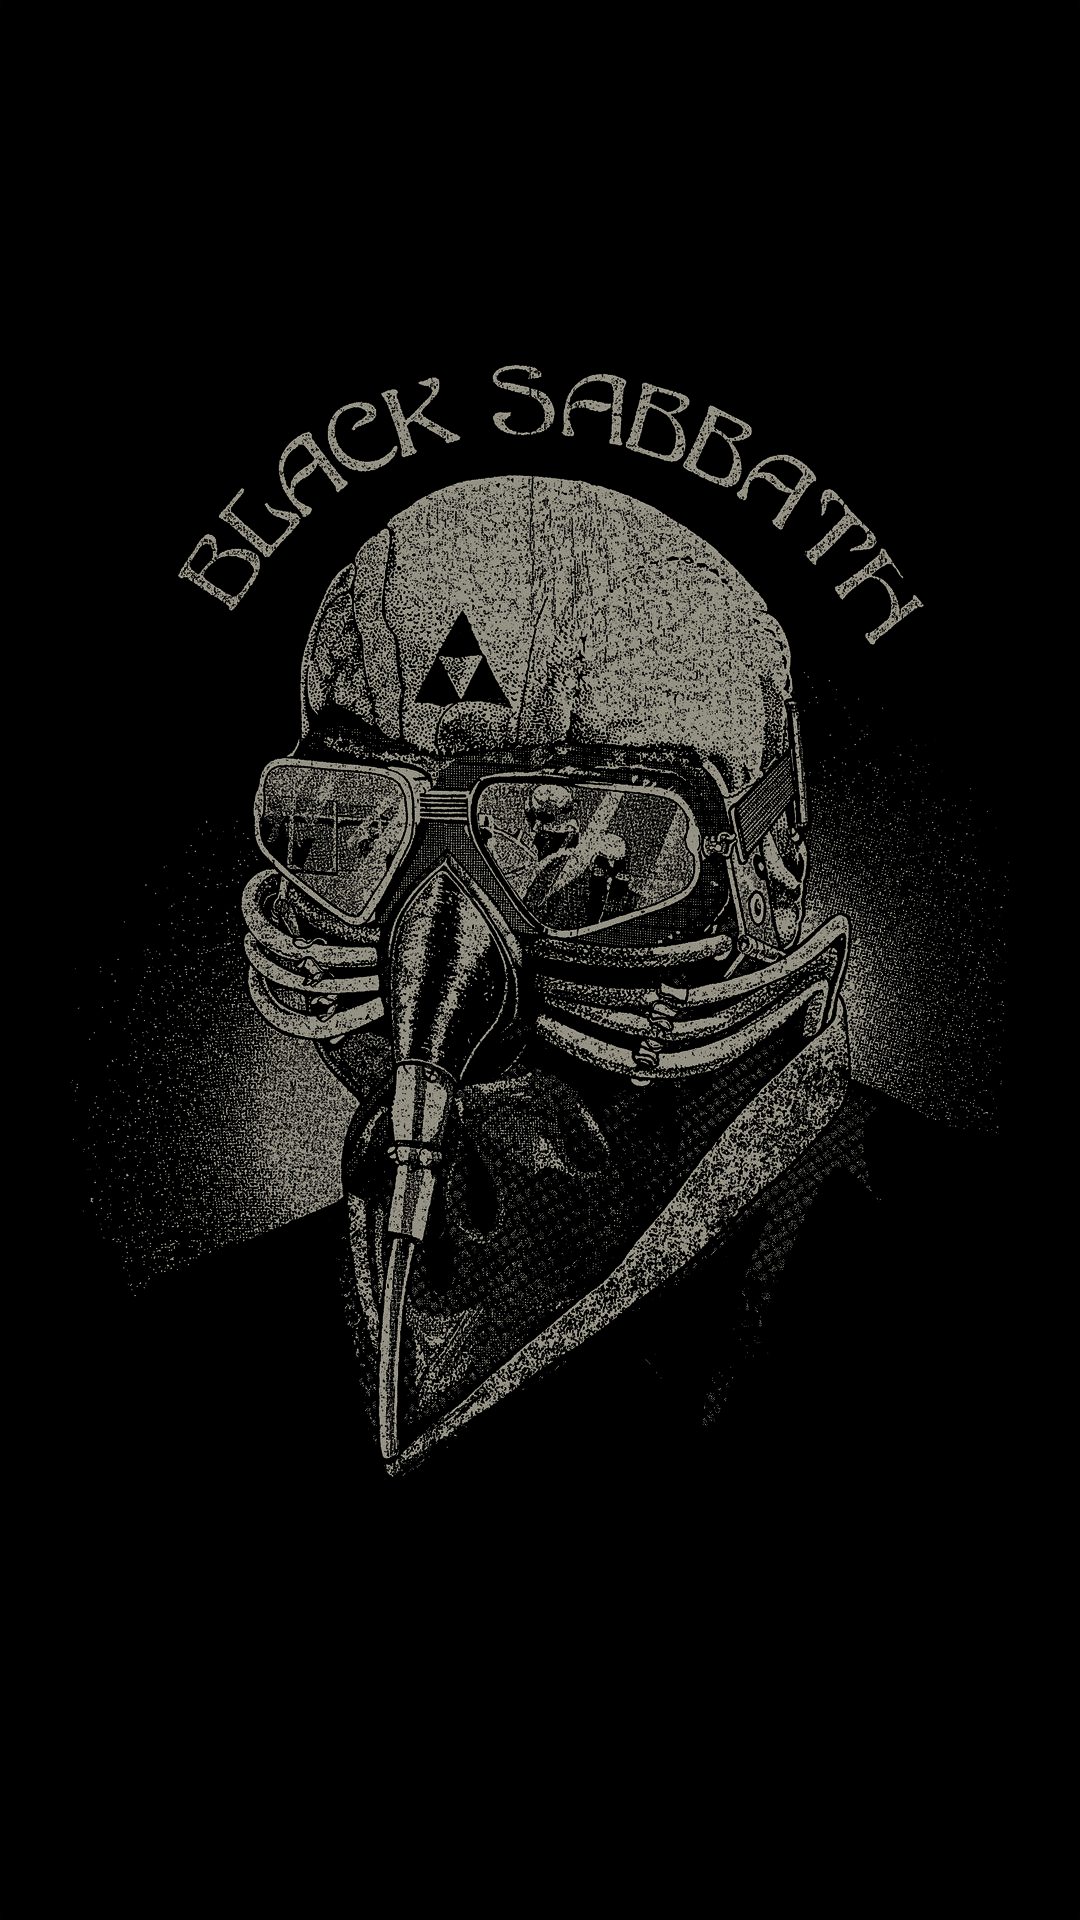 Black Sabbath Wallpapers - Top Free ...